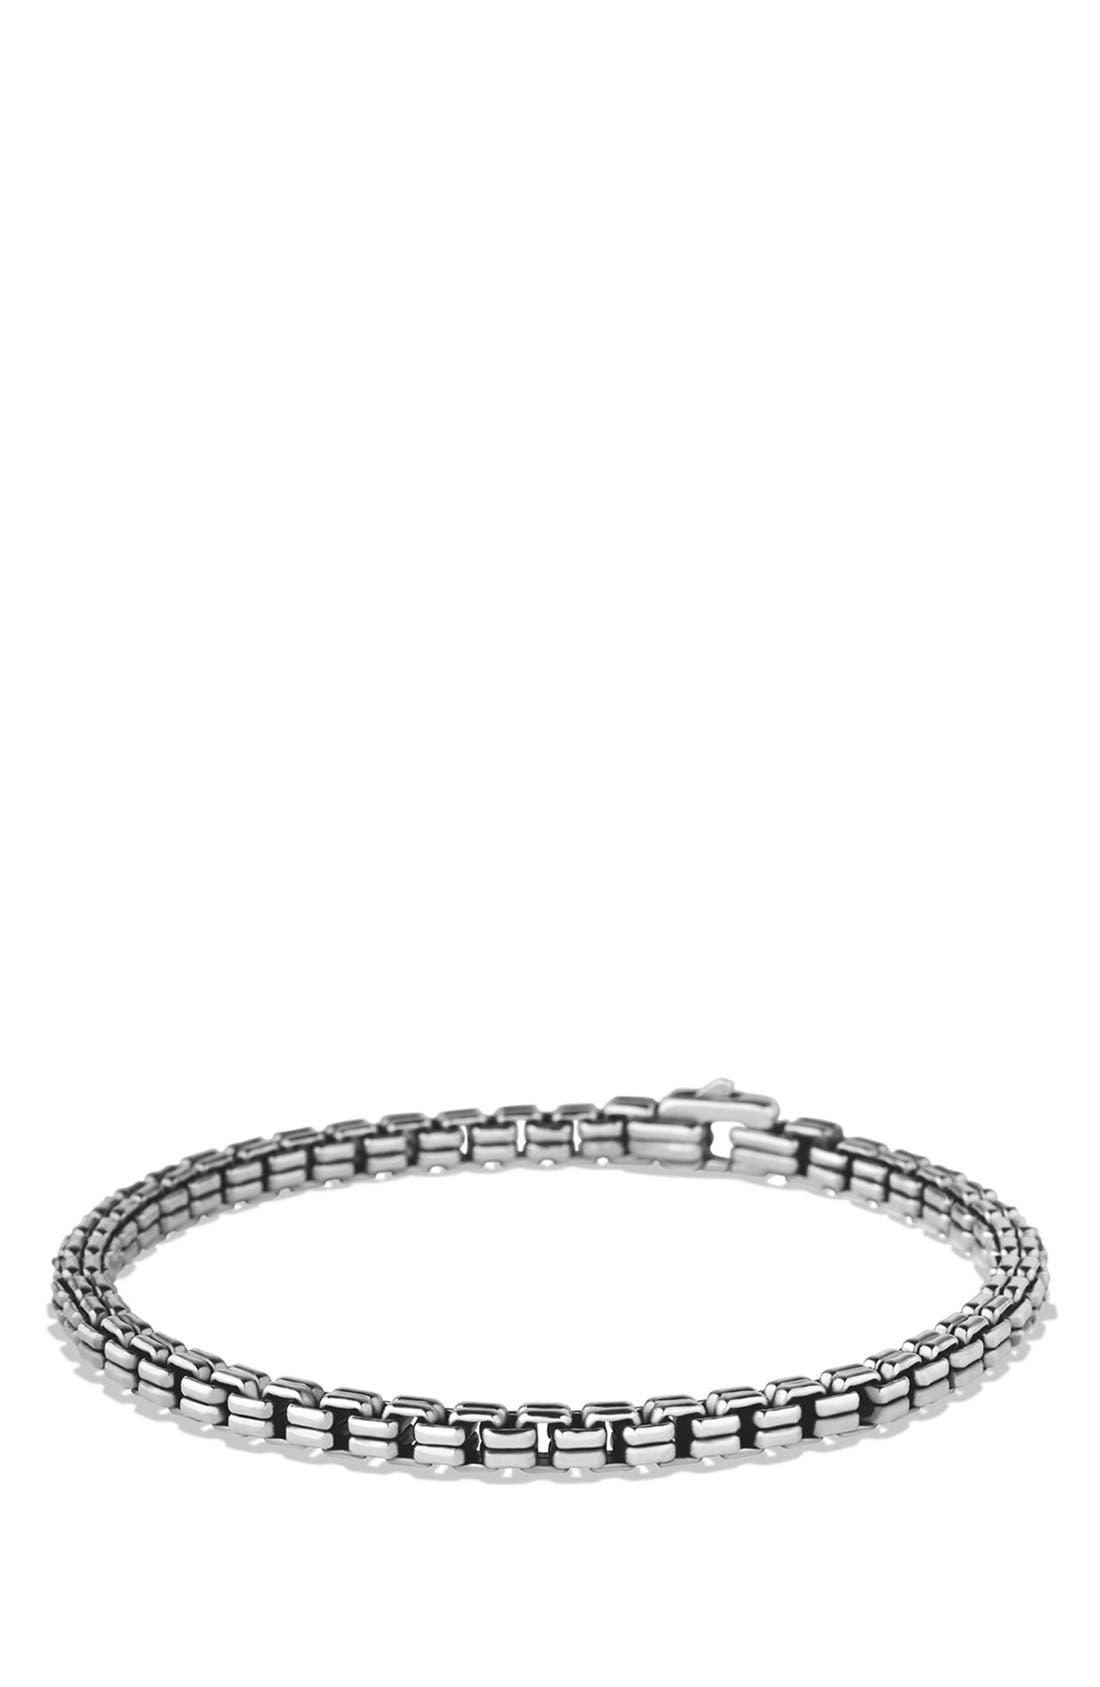 DAVID YURMAN 'Chain' Double Box Chain Bracelet, Main, color, SILVER